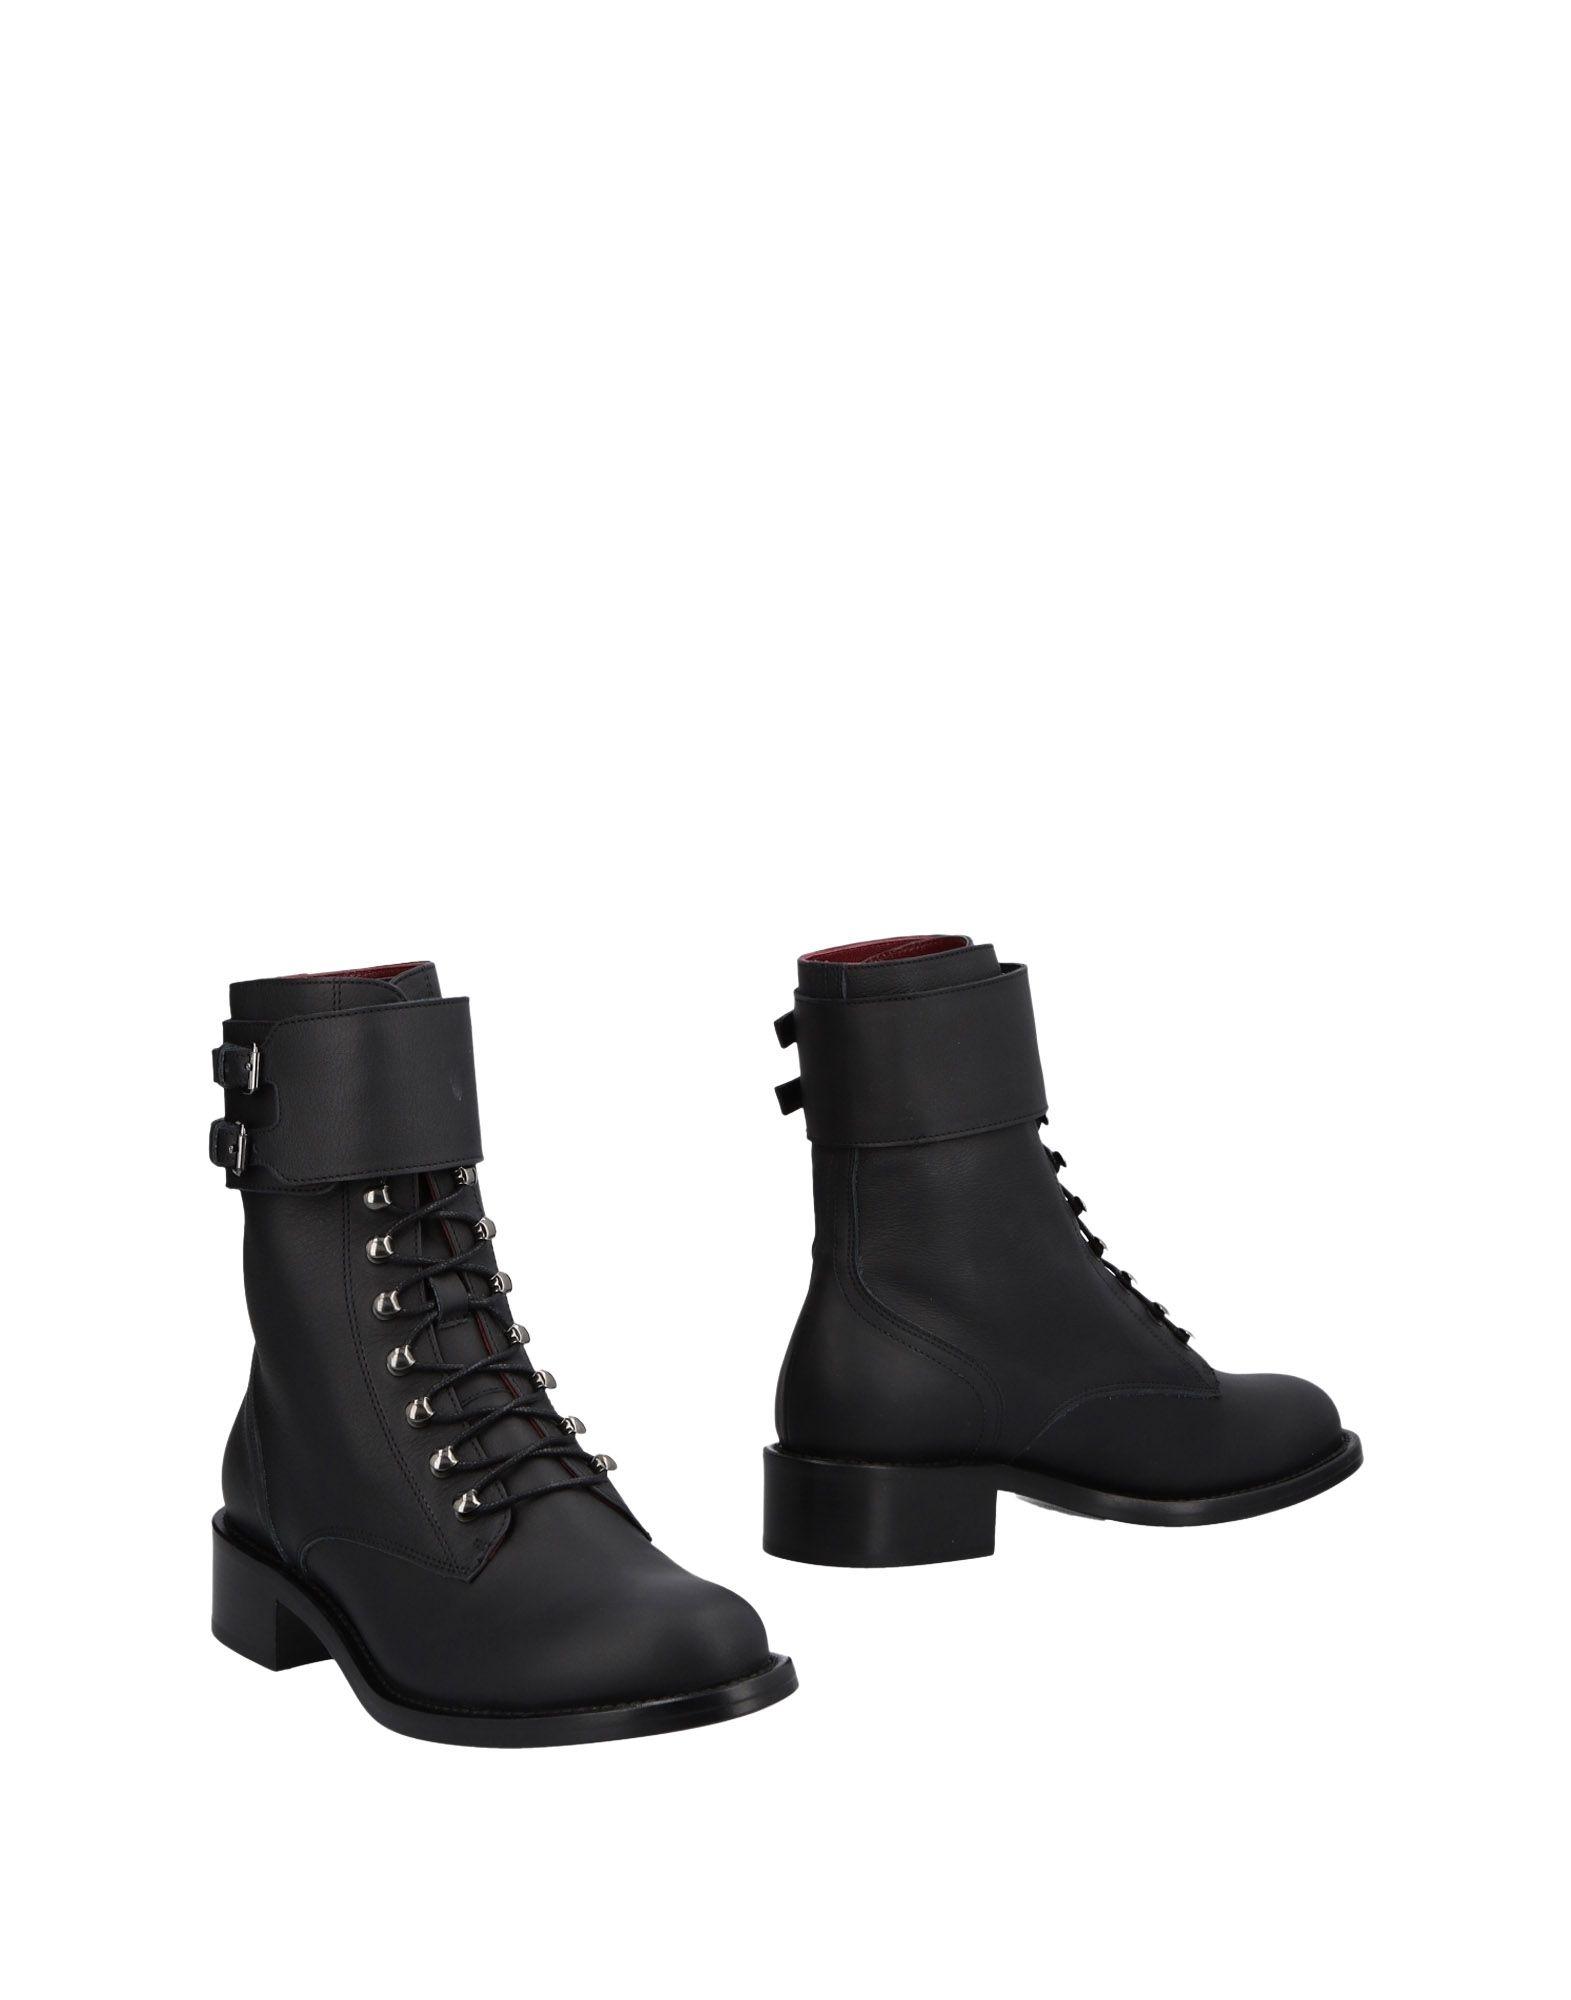 Philosophy Di Lorenzo Serafini Ankle Boot Lorenzo - Women Philosophy Di Lorenzo Boot Serafini Ankle Boots online on  Australia - 11474714OO 763376